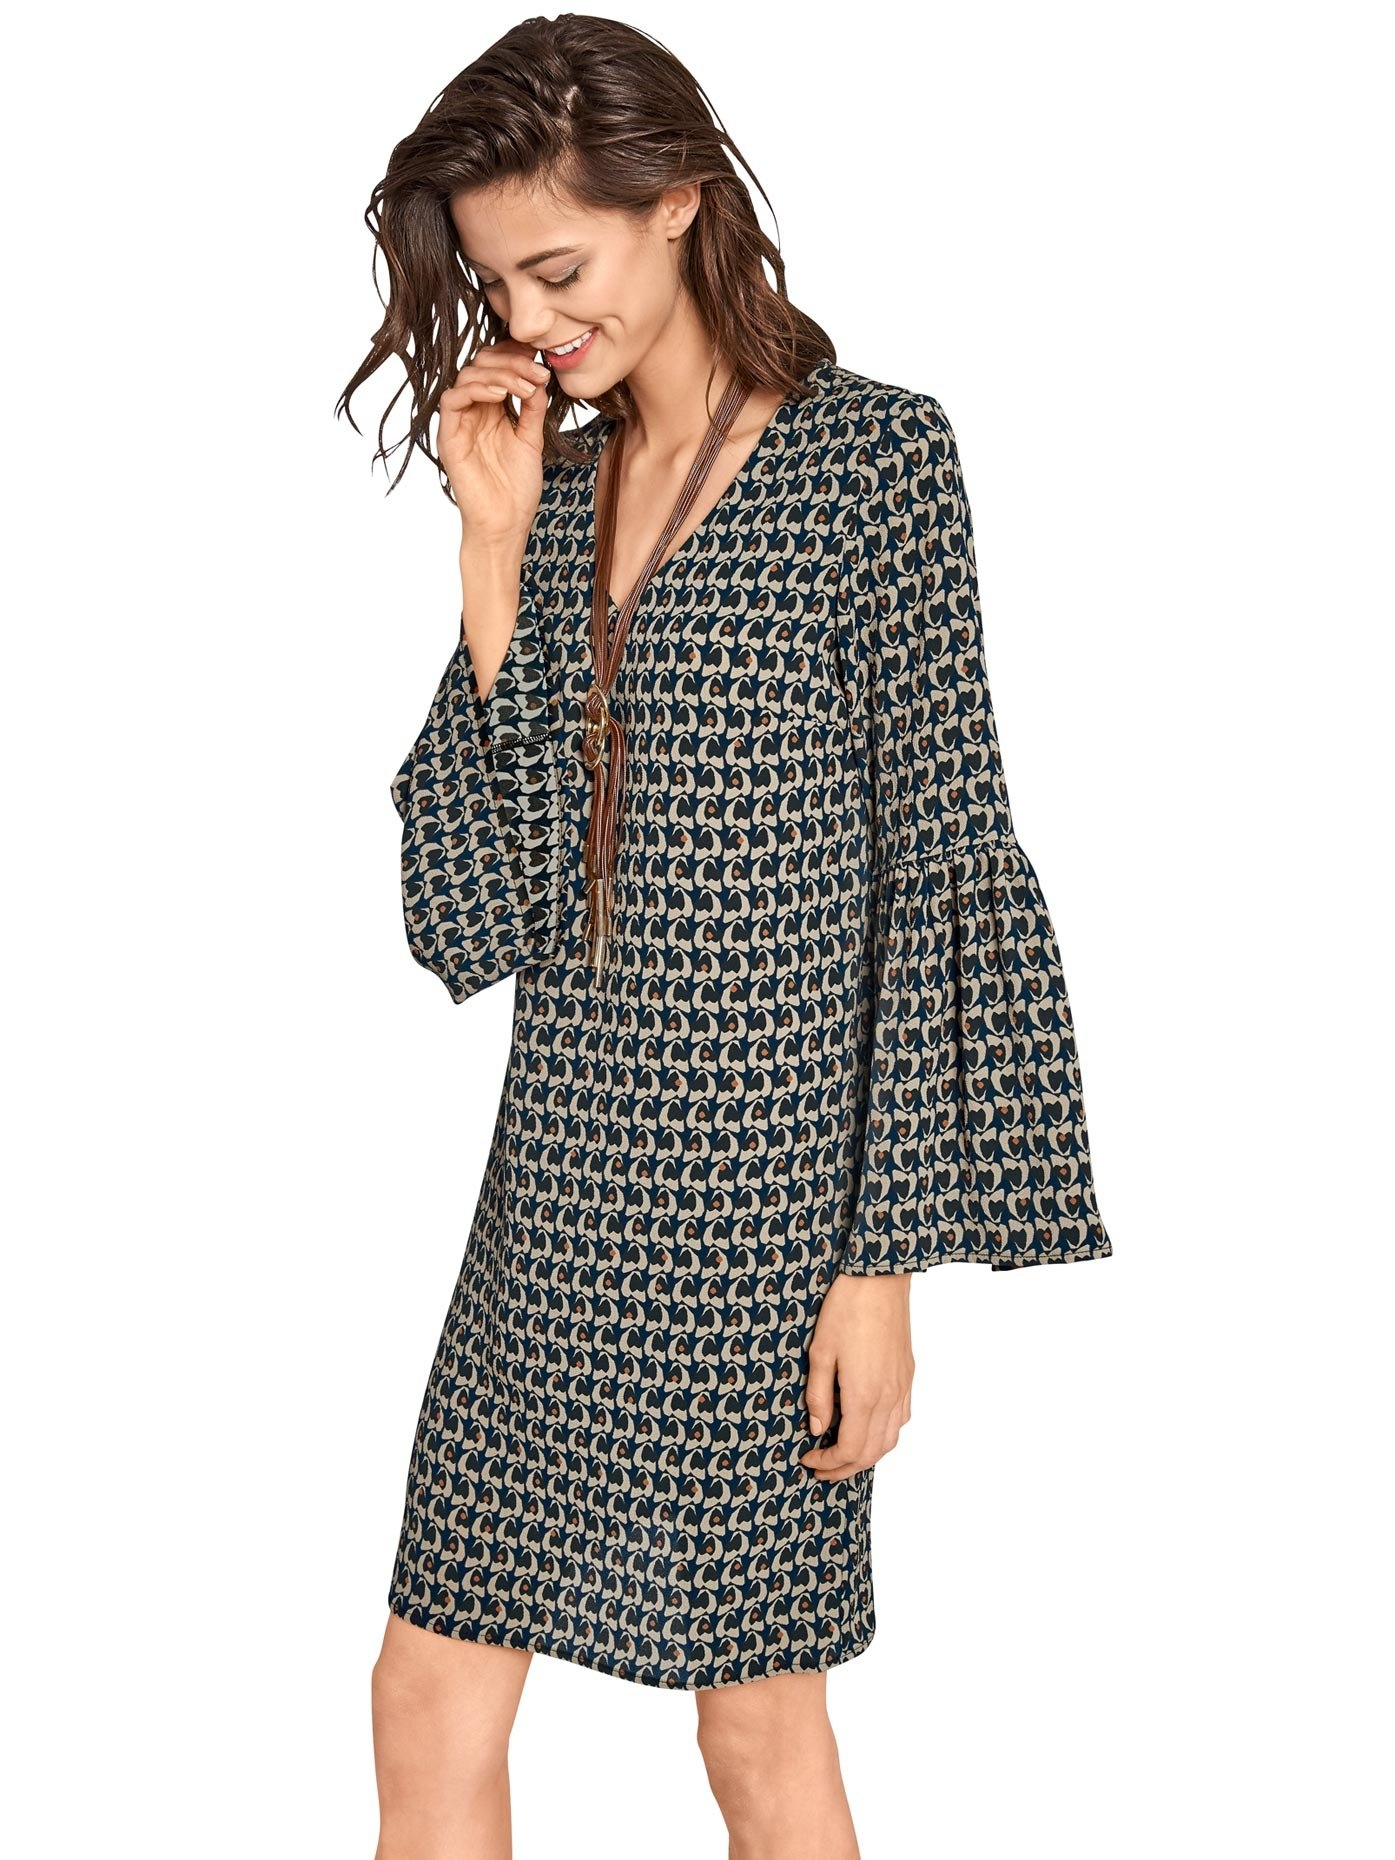 LINEA TESINI by Heine gedessineerde jurk bestellen: 30 dagen bedenktijd